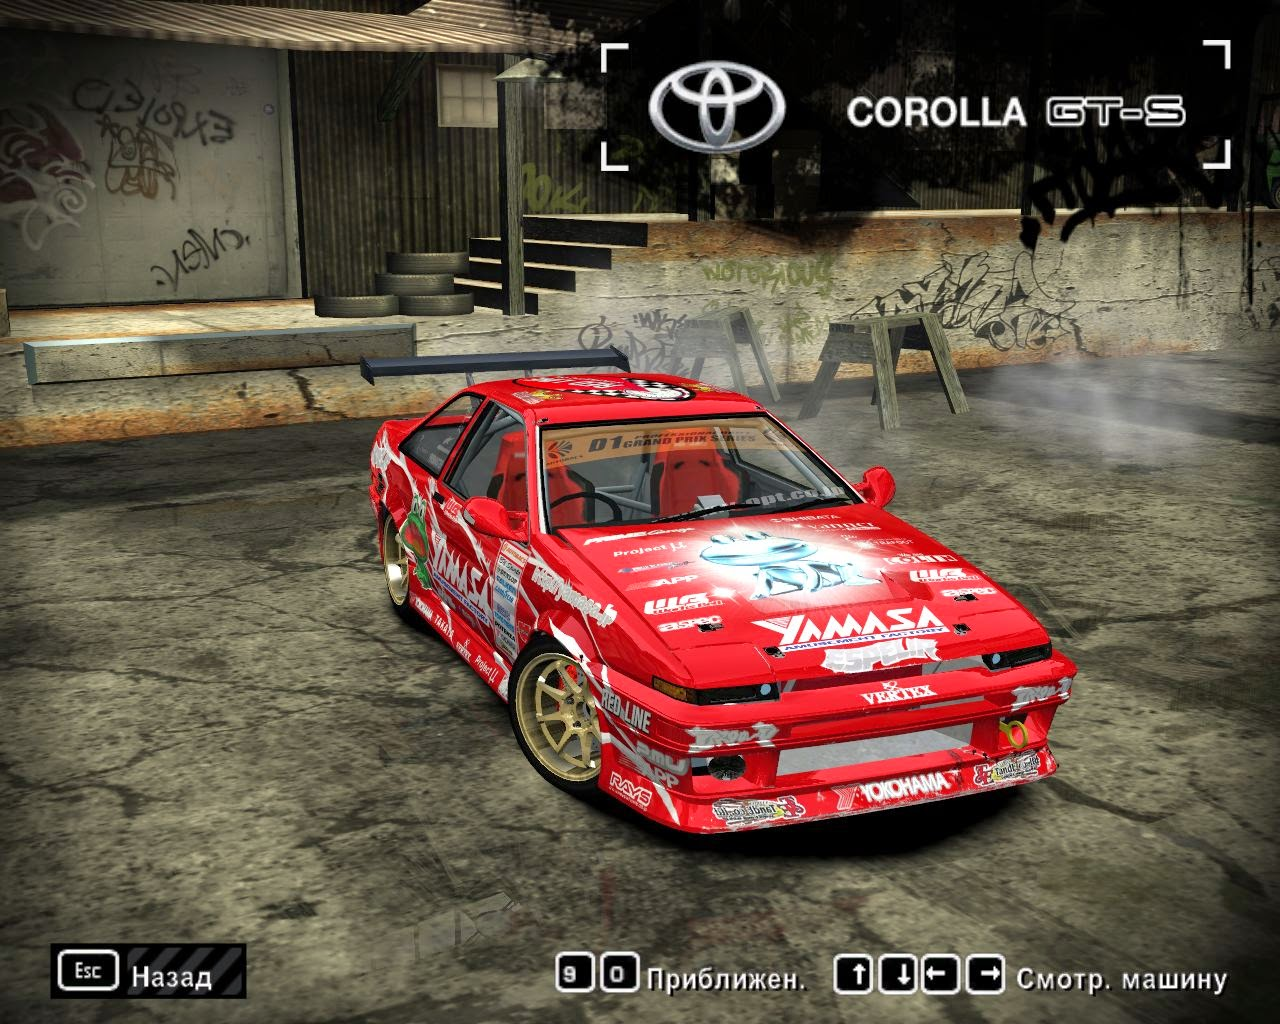 43 Koleksi Mod Mobil Nfs Most Wanted 2005 HD Terbaik